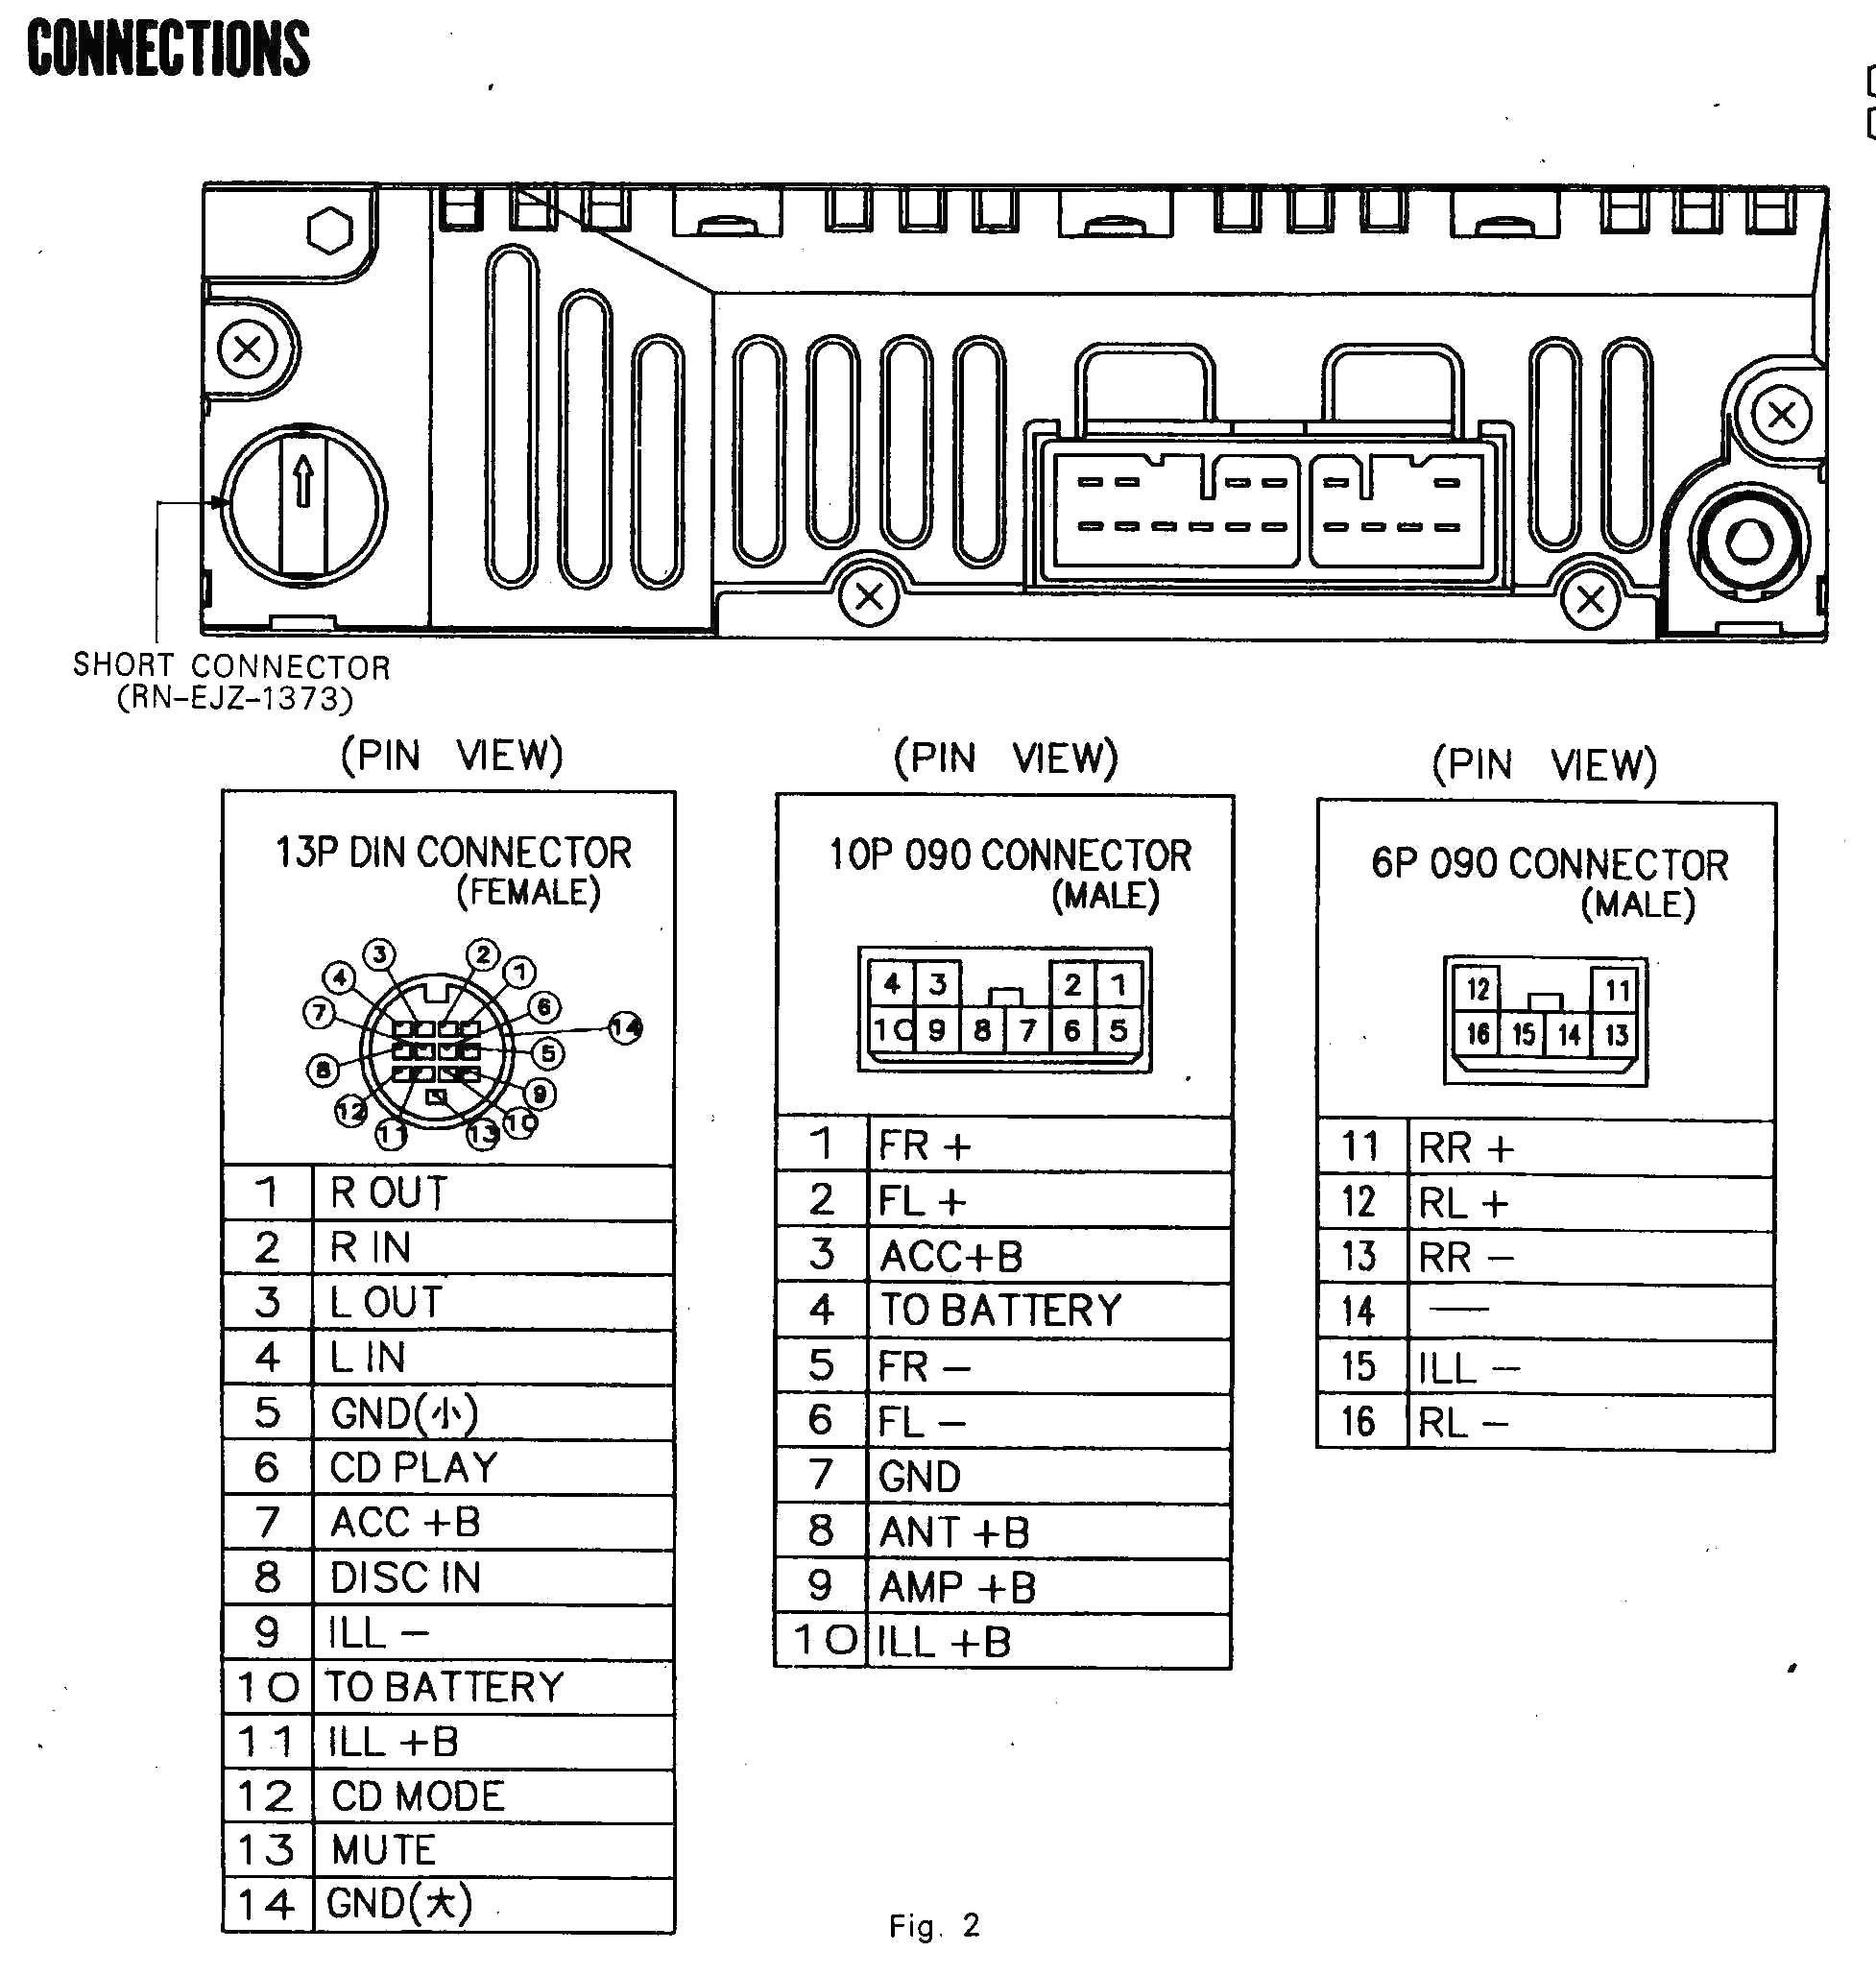 sony cd player wiring diagram 5915 sony car cd player wiring diagram my wiring diagram  5915 sony car cd player wiring diagram